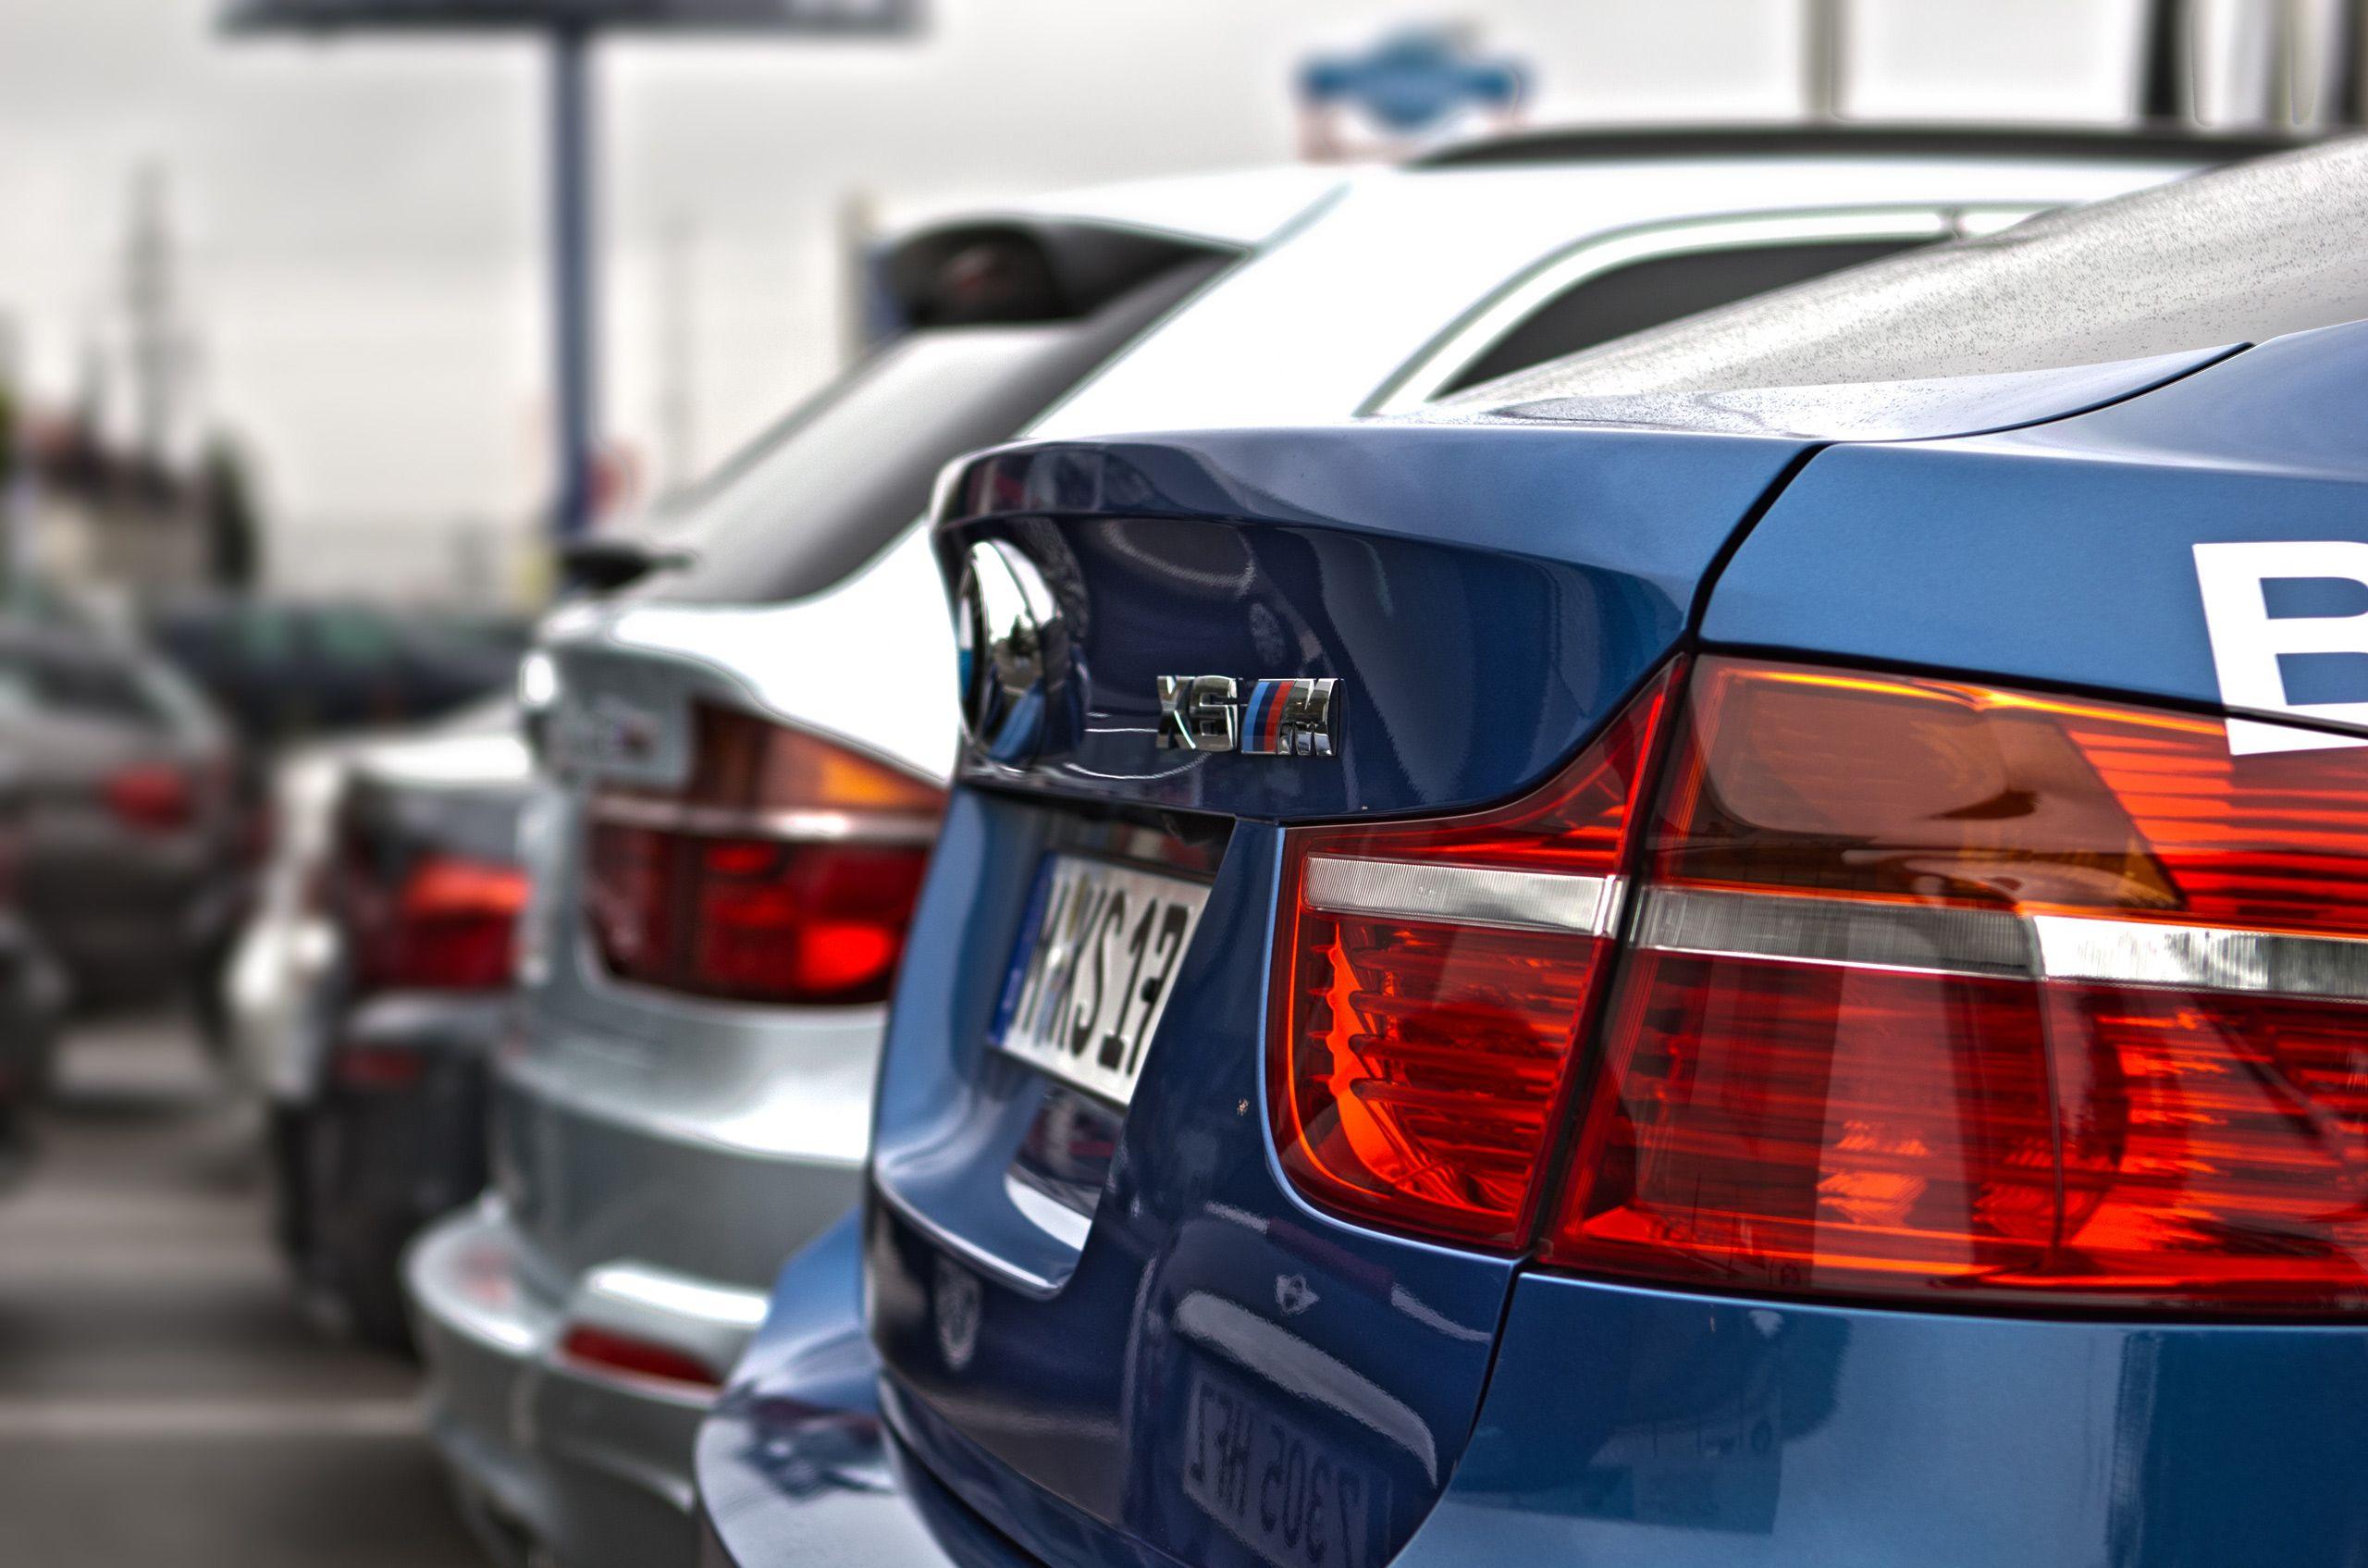 Zaga de BMW X6M en Autosa